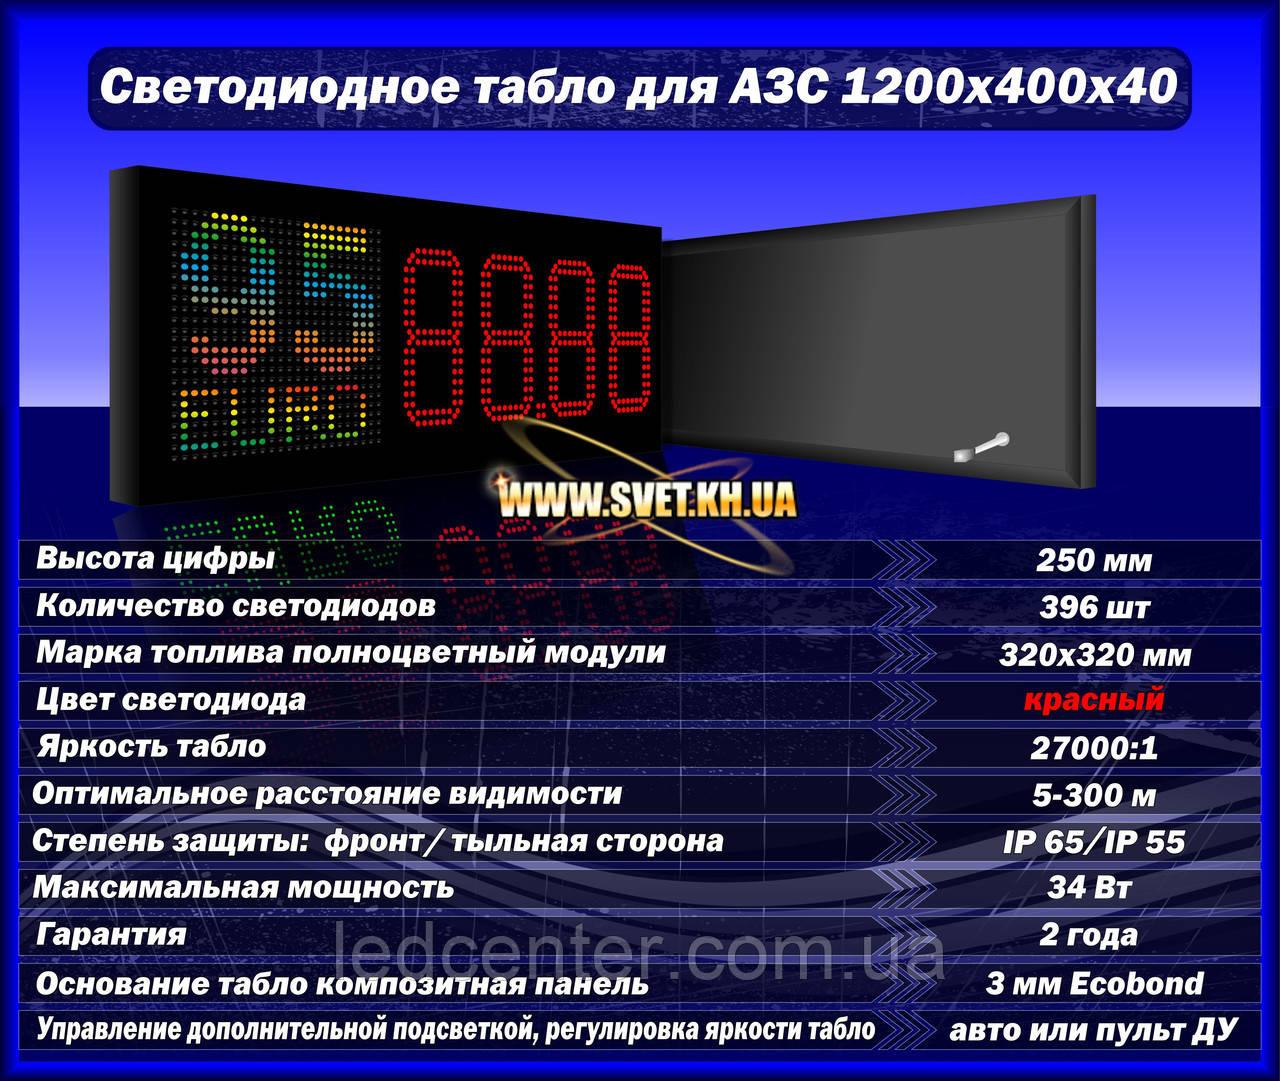 Електронне табло стел для АЗС, марка палива поноцветные модулі